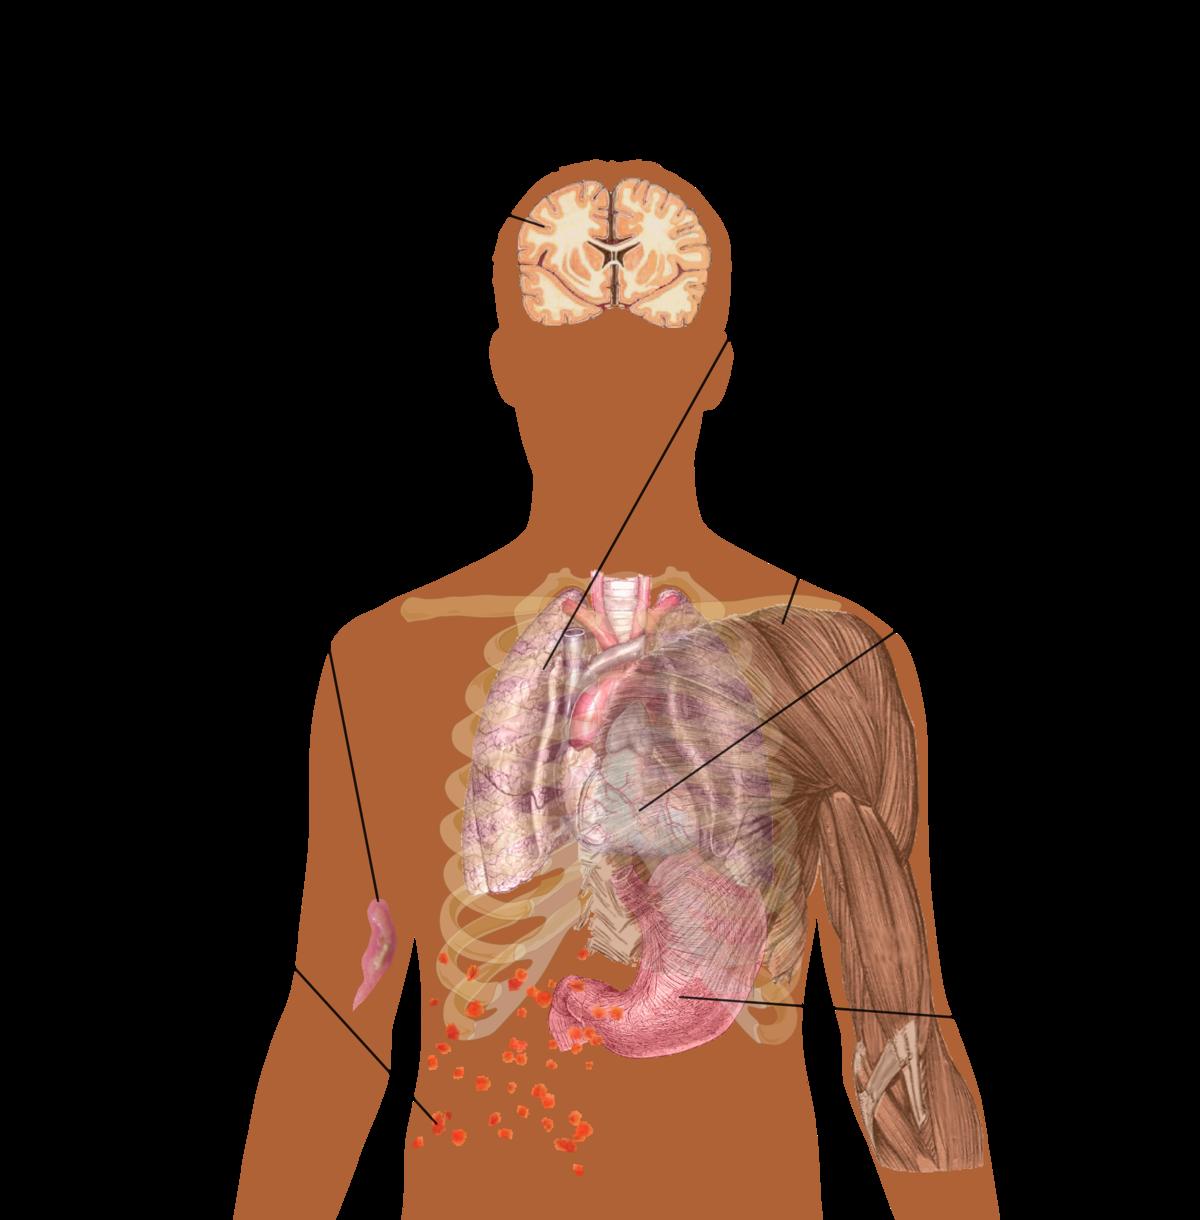 simptomele dipyllobothriasis la adulți papillomavirus vaccin conditions